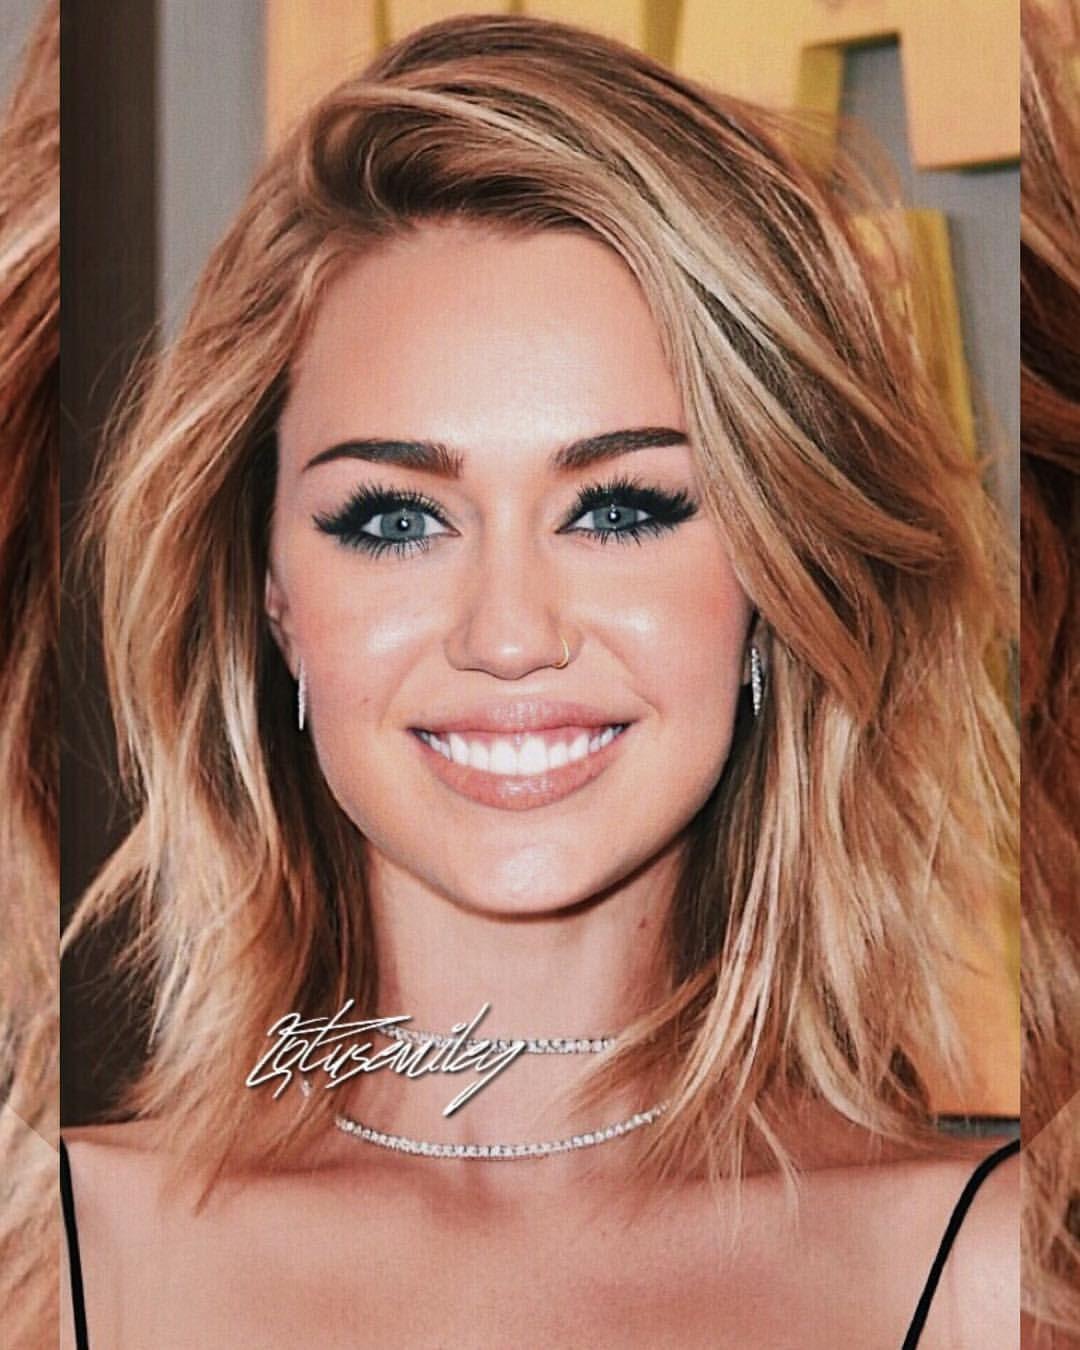 Pin By Christiann Igou On Hair In 2020 Mom Hairstyles Miley Cyrus Hair Medium Hair Styles